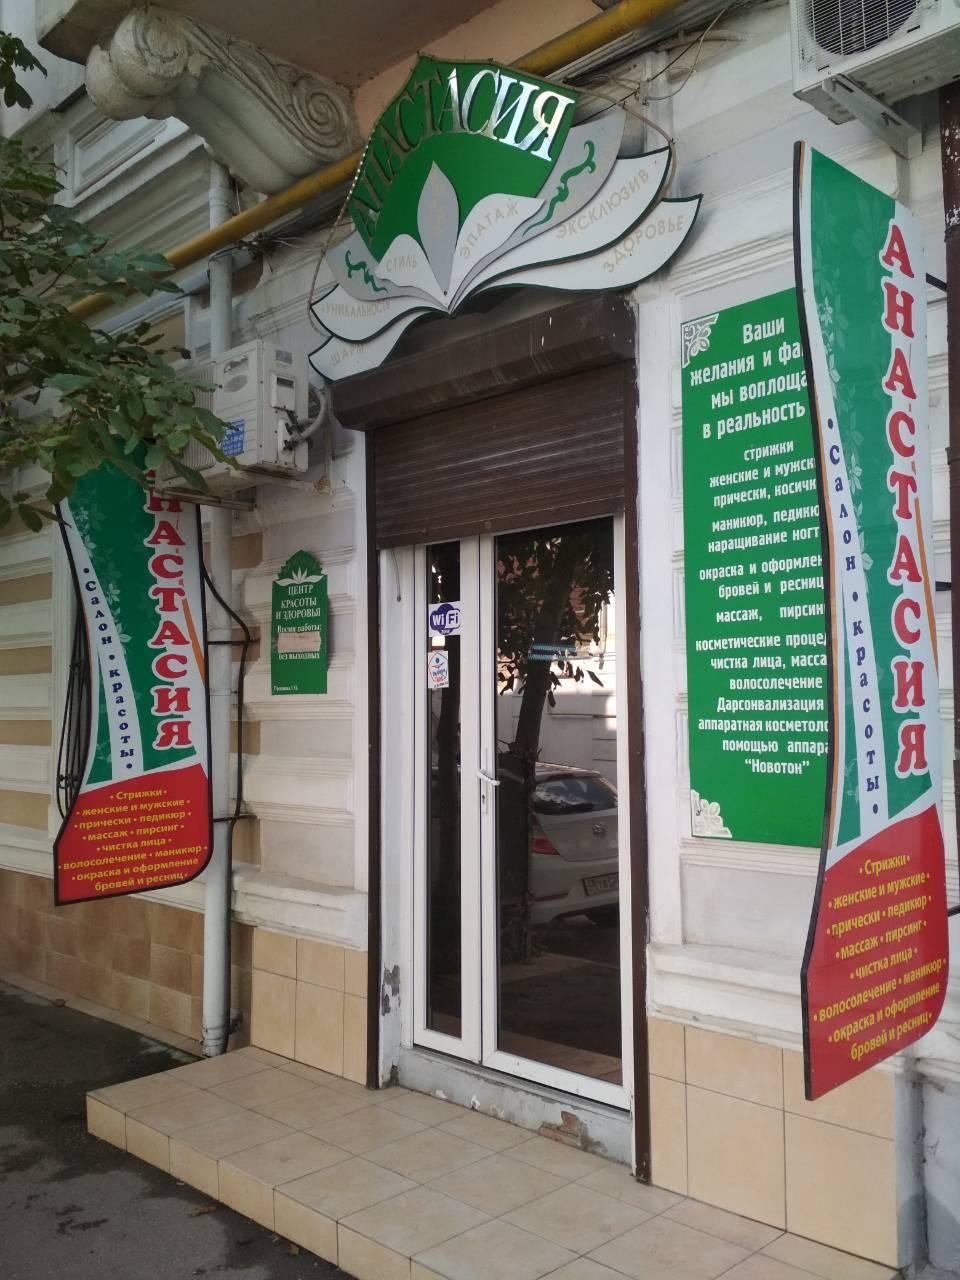 Фирма: Салон-парикмахерская Анастасия. Косметология